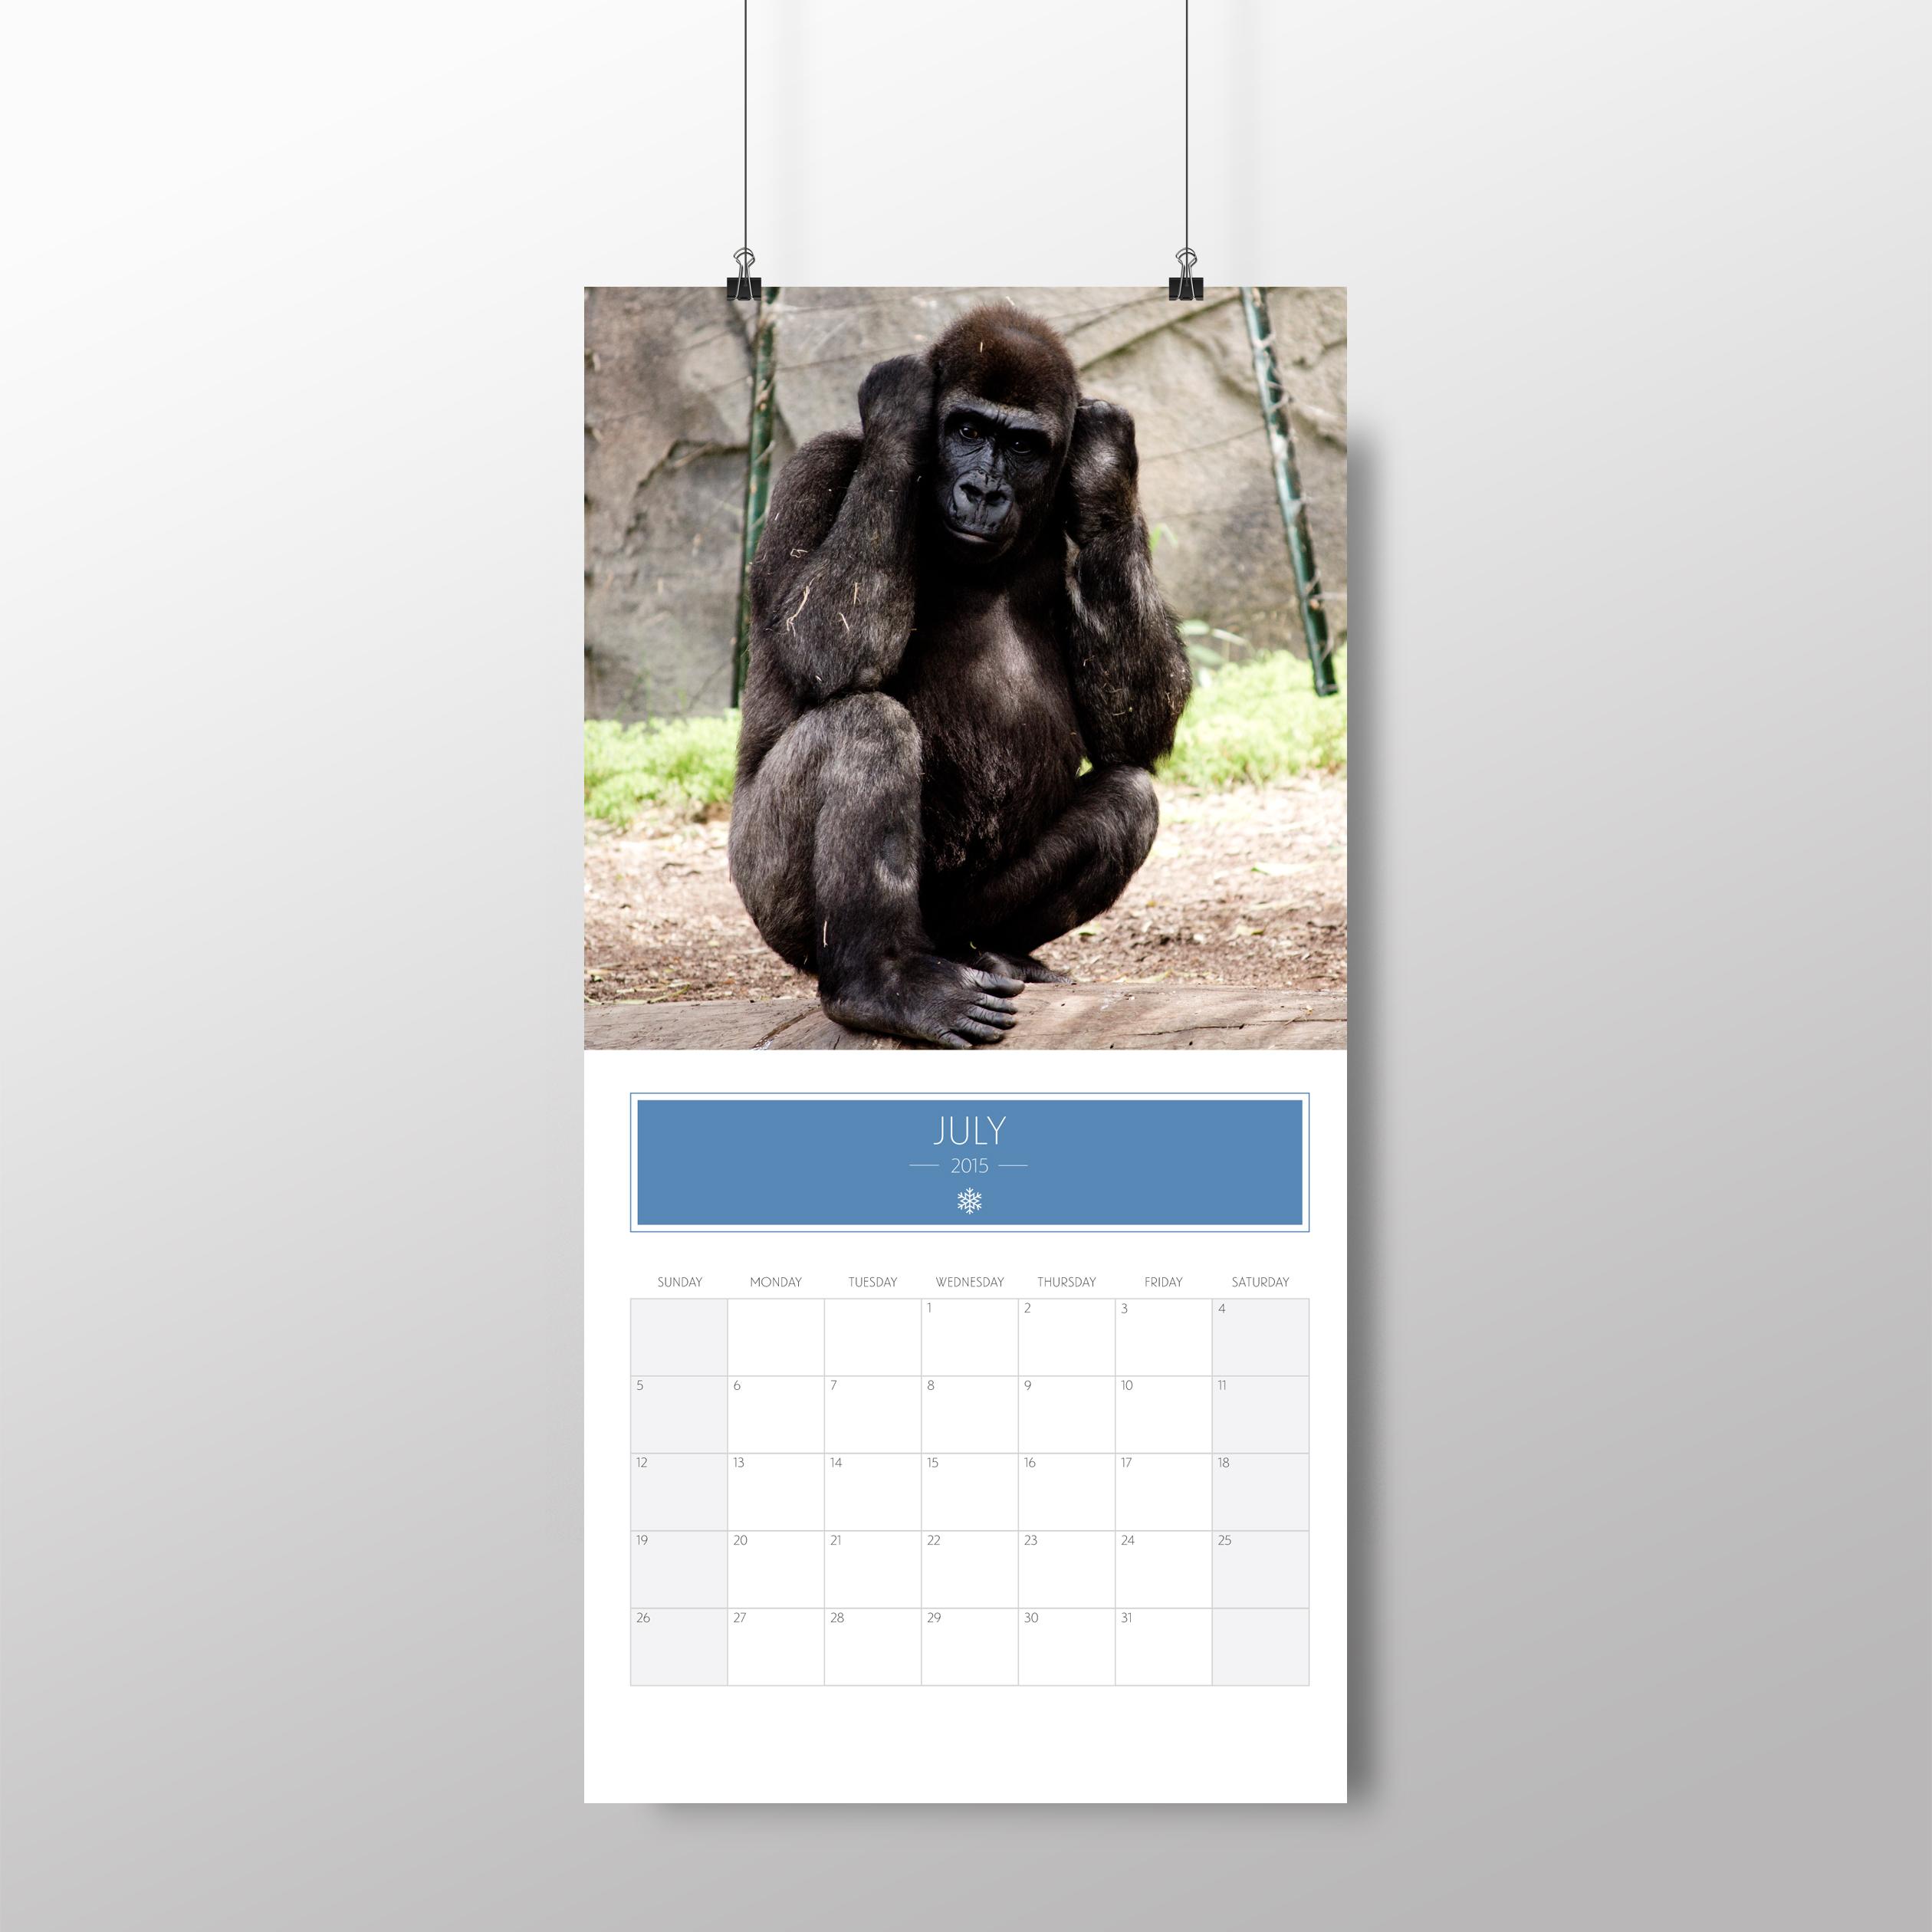 Animal calendar – July